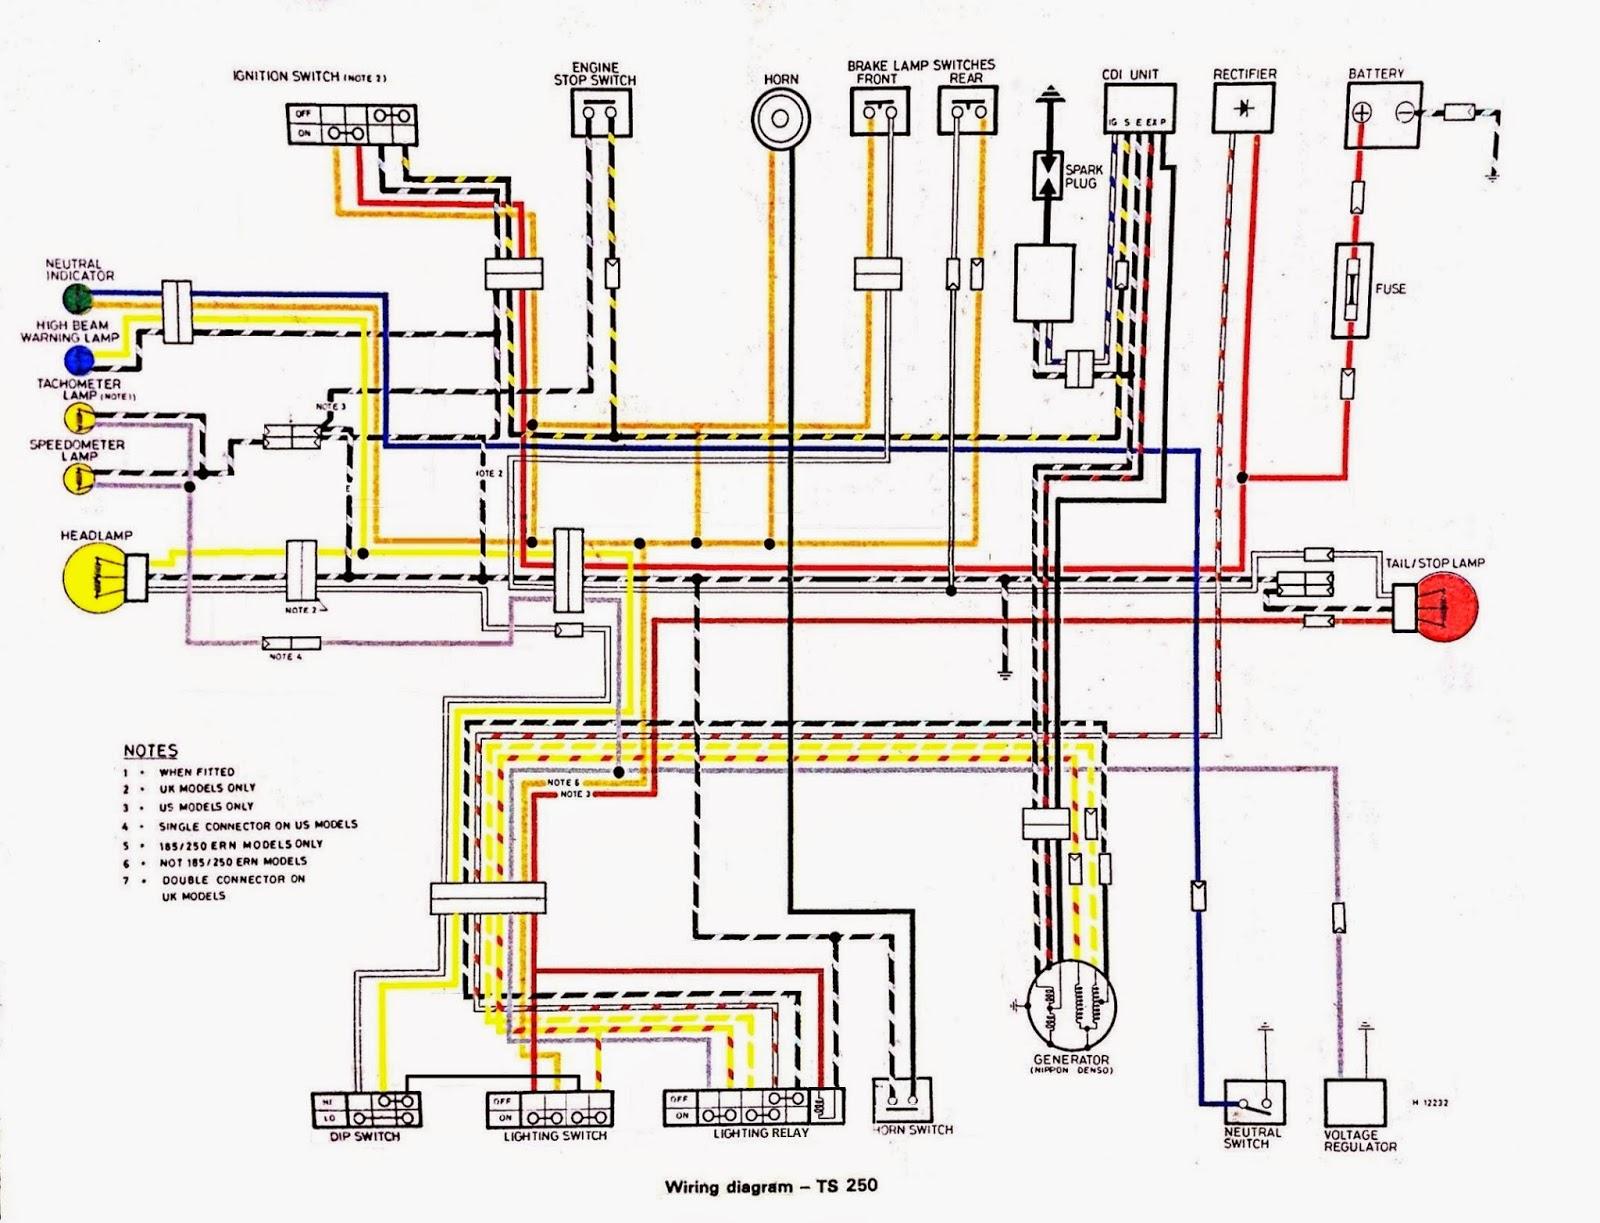 DT_2759] Suzuki Motorcycle Wiring Diagrams Free Free DiagramNnigh Trua Numap Ittab Licuk Mohammedshrine Librar Wiring 101